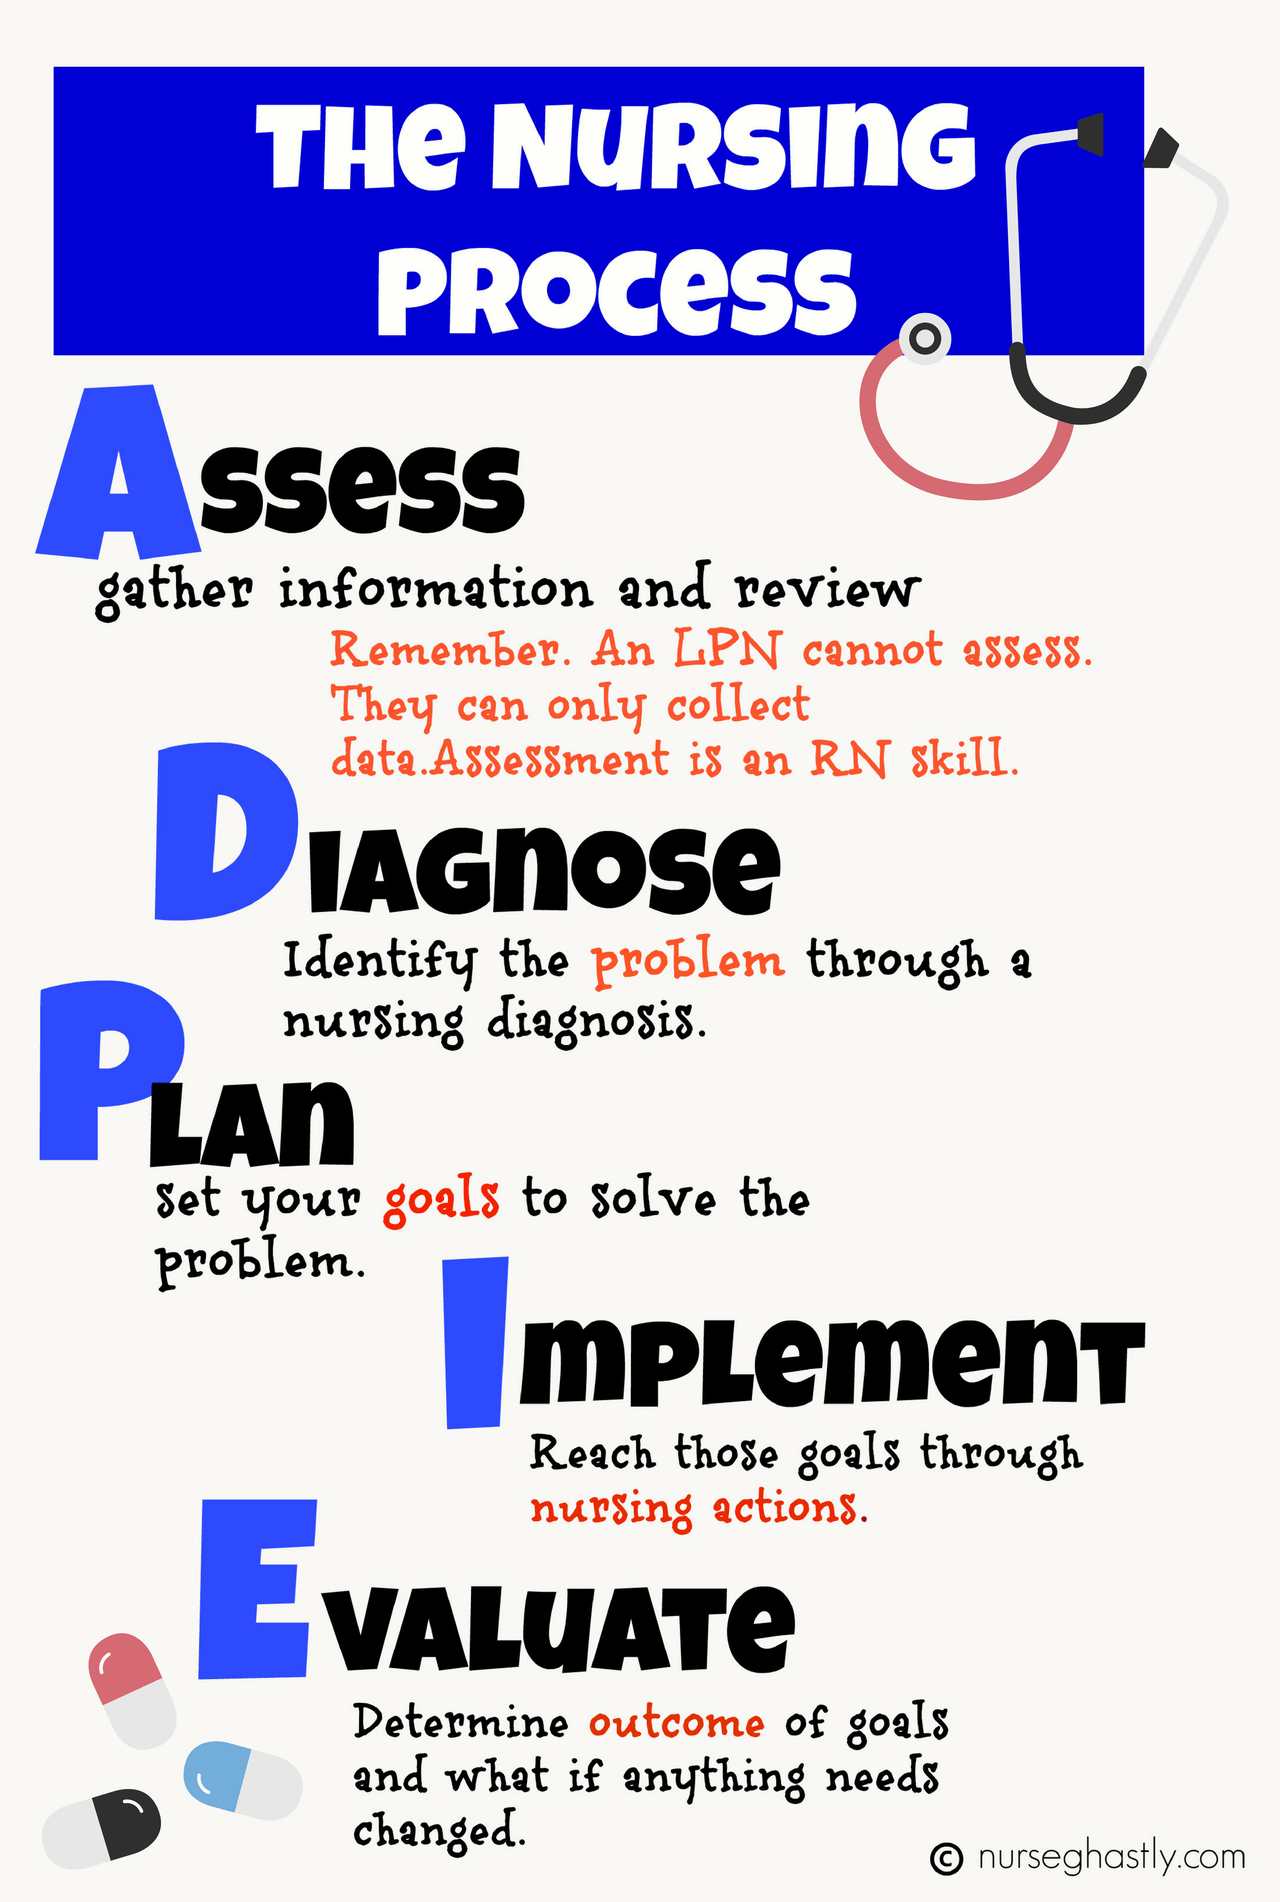 Case study nursing process Coursework Example - June 2019 - 1222 words